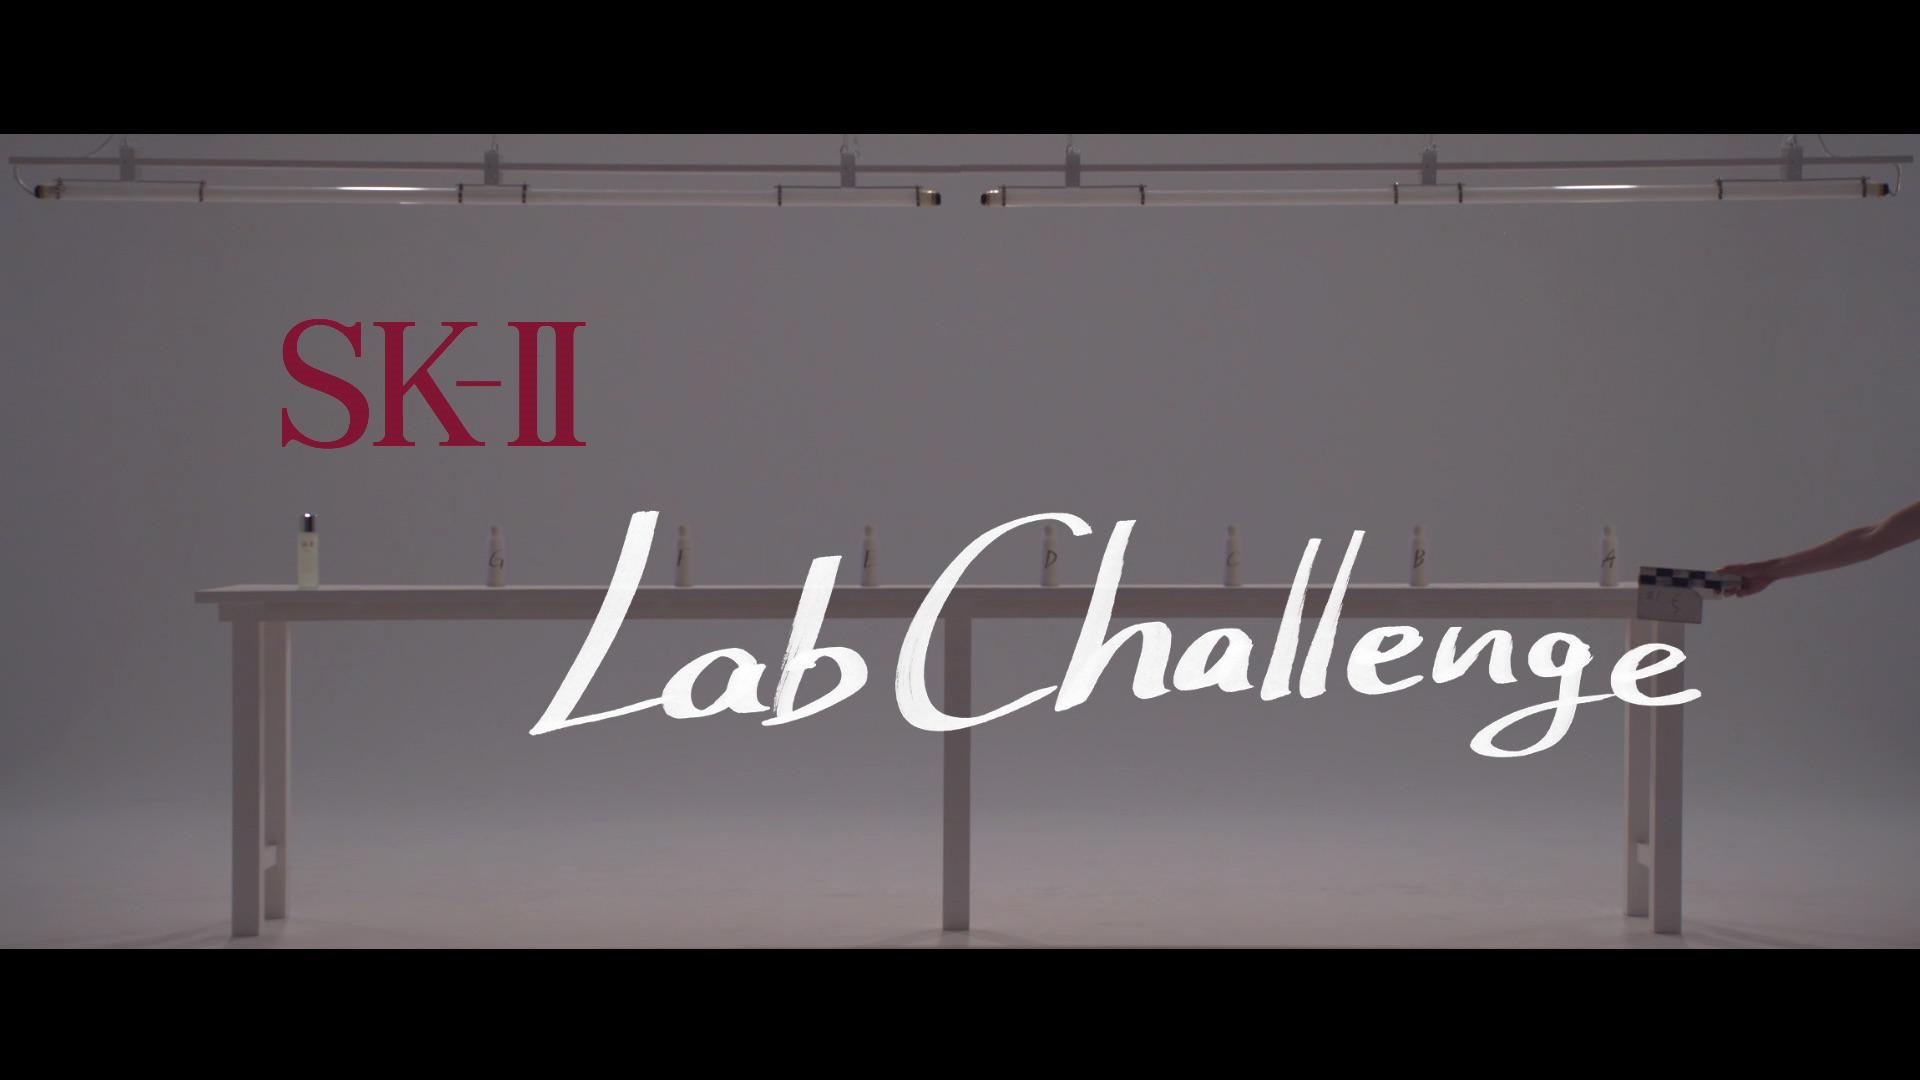 SK-Ⅱ 「Lab Challenge」